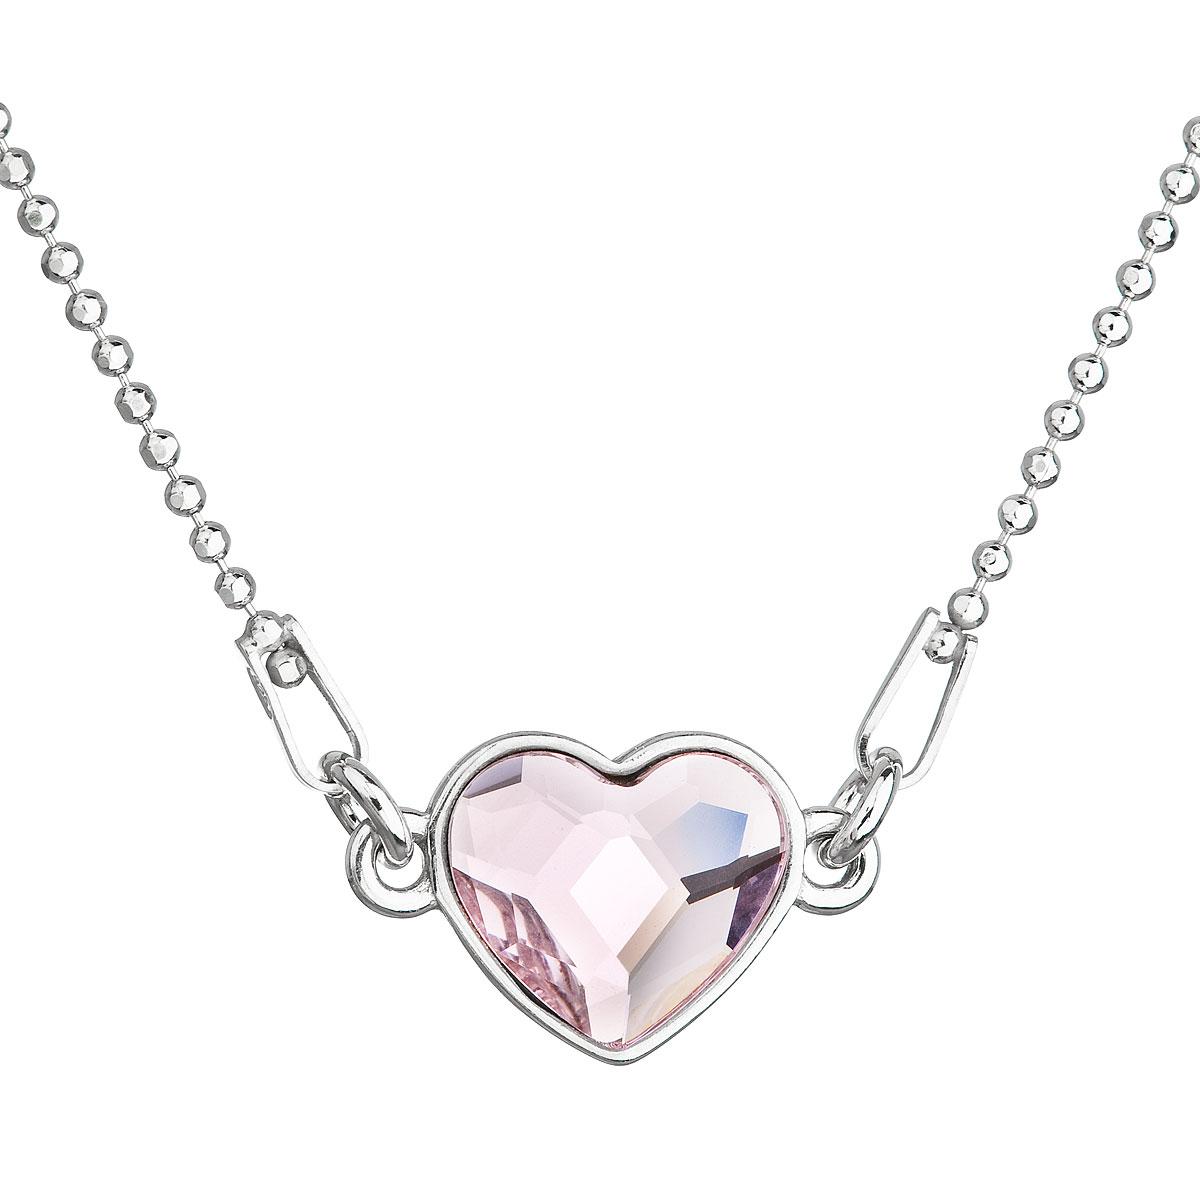 Strieborný náhrdelník s krištálom Swarovski ružové srdce 32061.3 rosaline